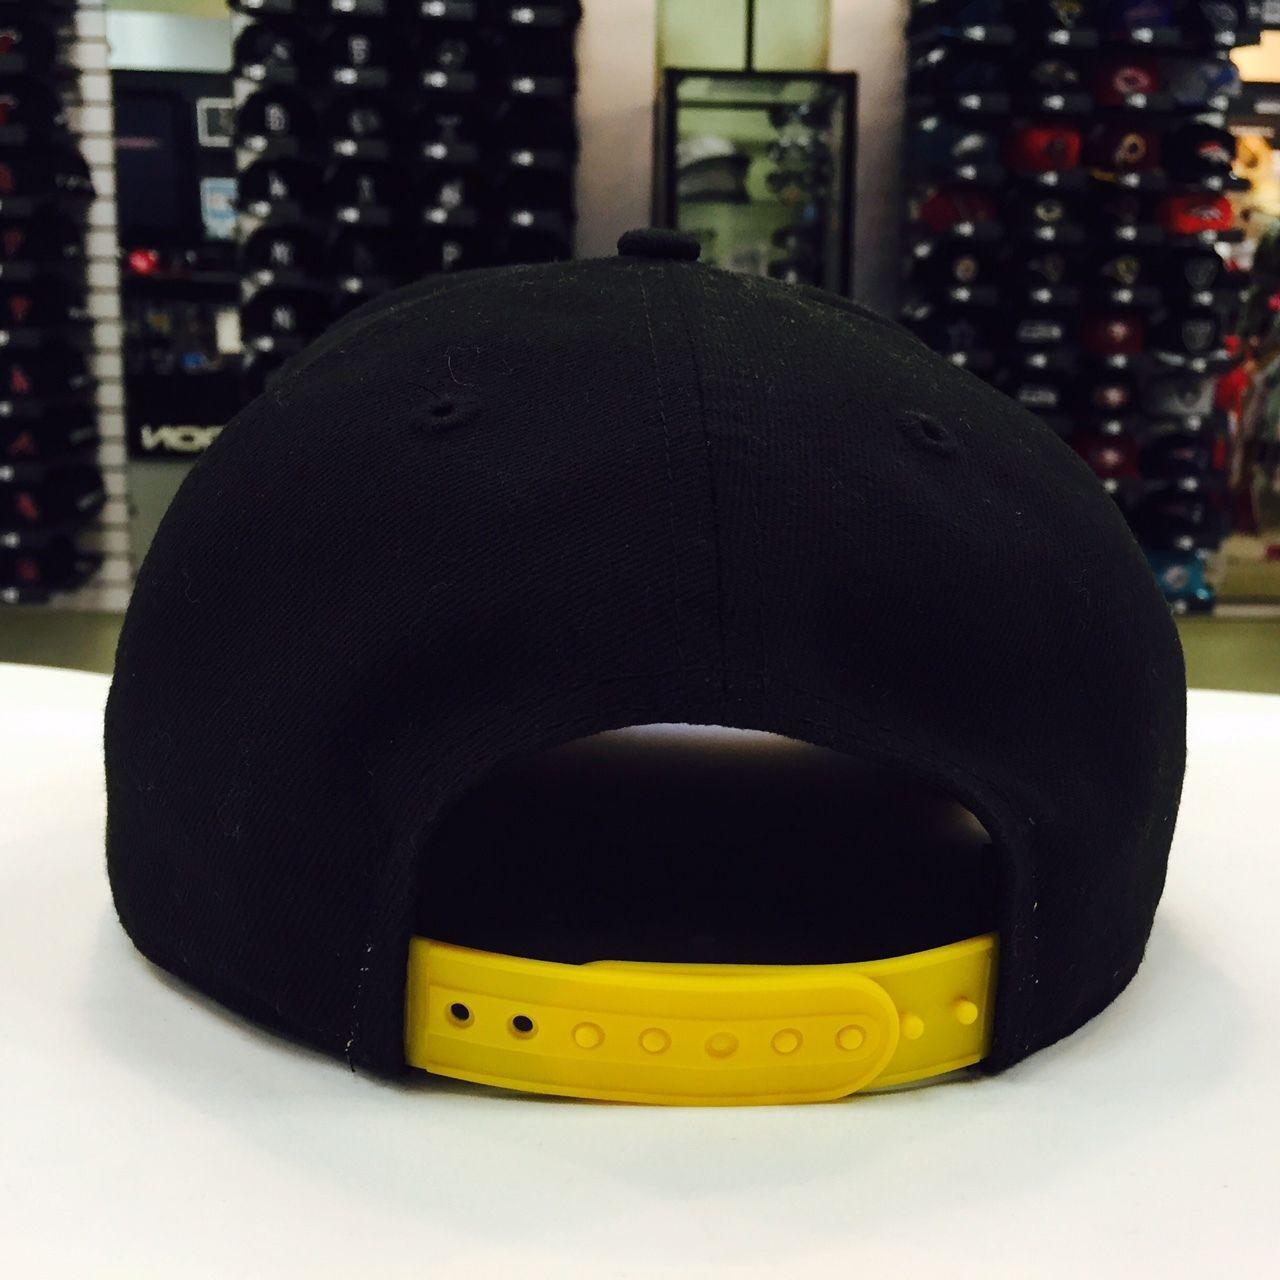 New Era 9FIFTY NFL Pittsburgh Steelers Vize SB XLIII Adjustable Cap/Hat 12052